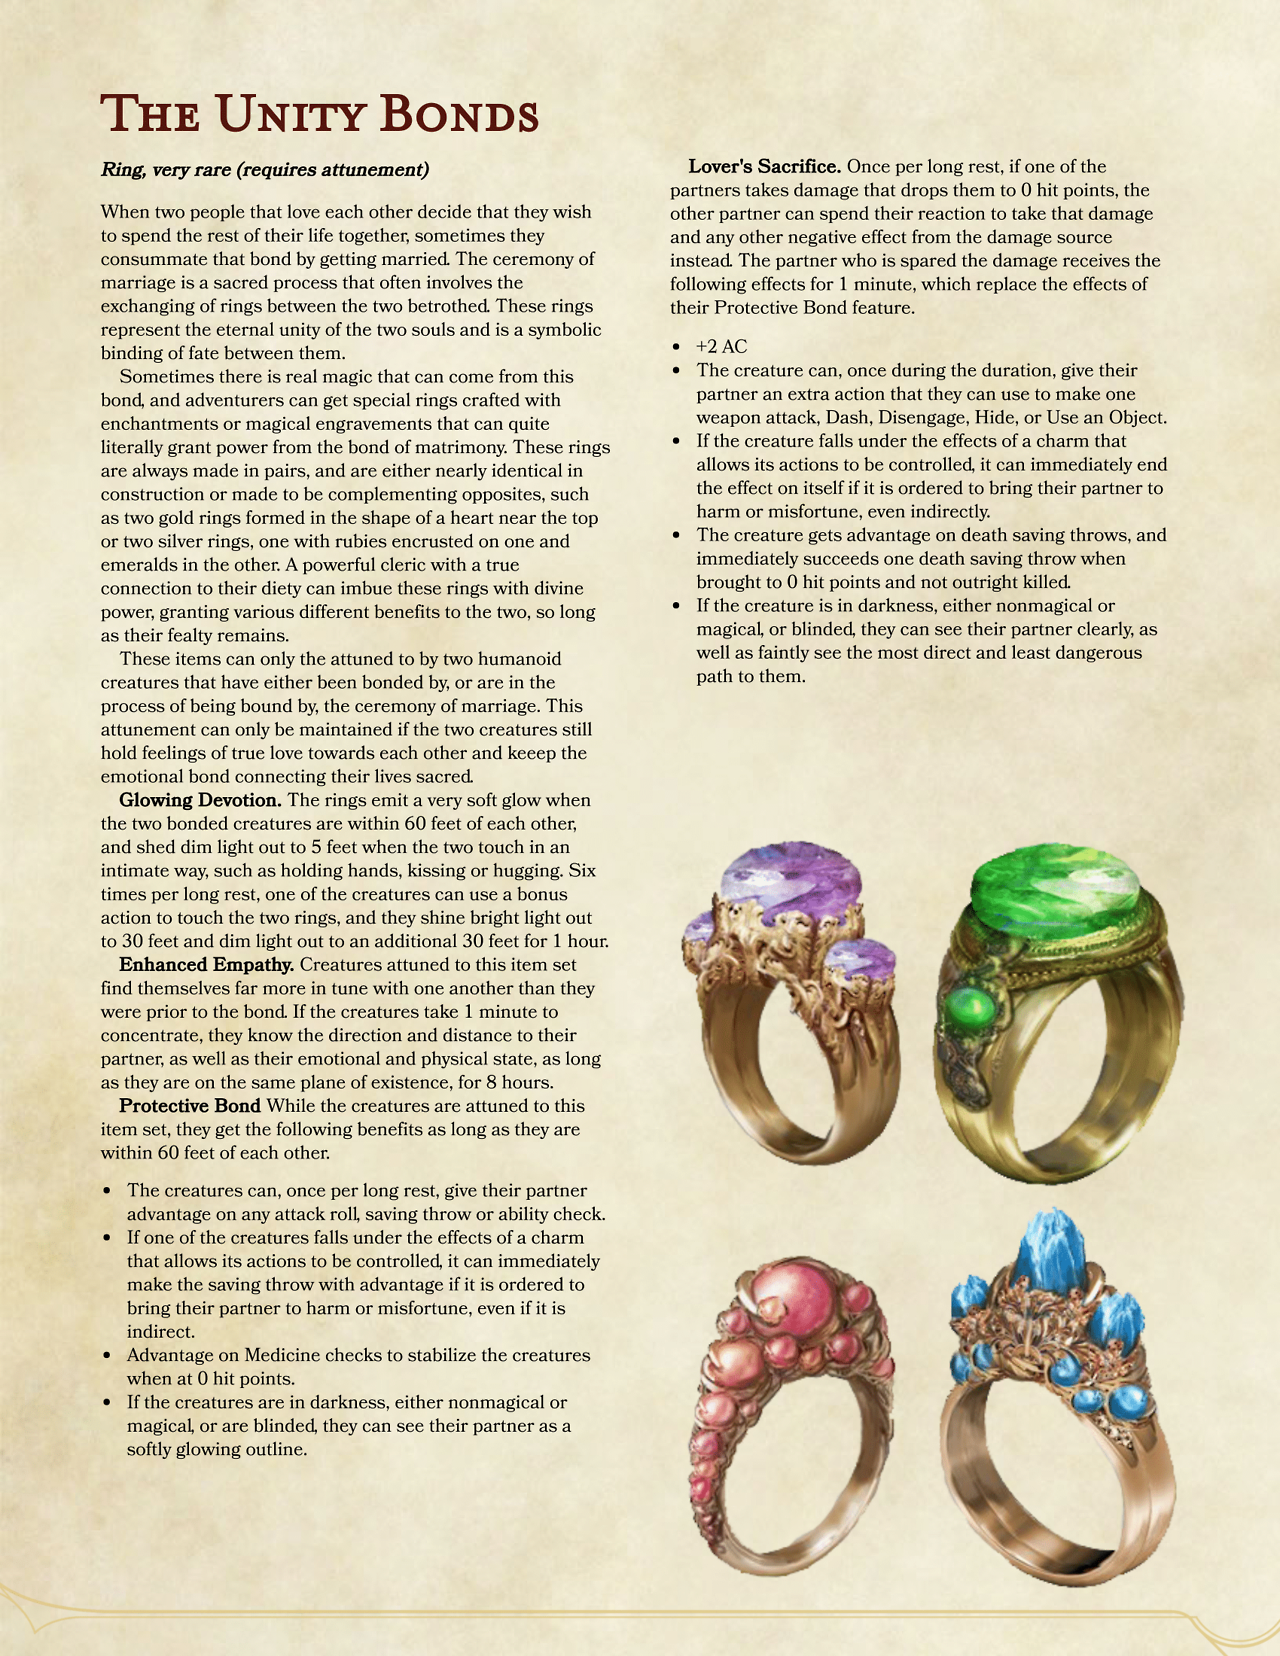 The Unity Bonds by ZowJr | DnD | Pinterest | Dnd 5e homebrew, RPG ...